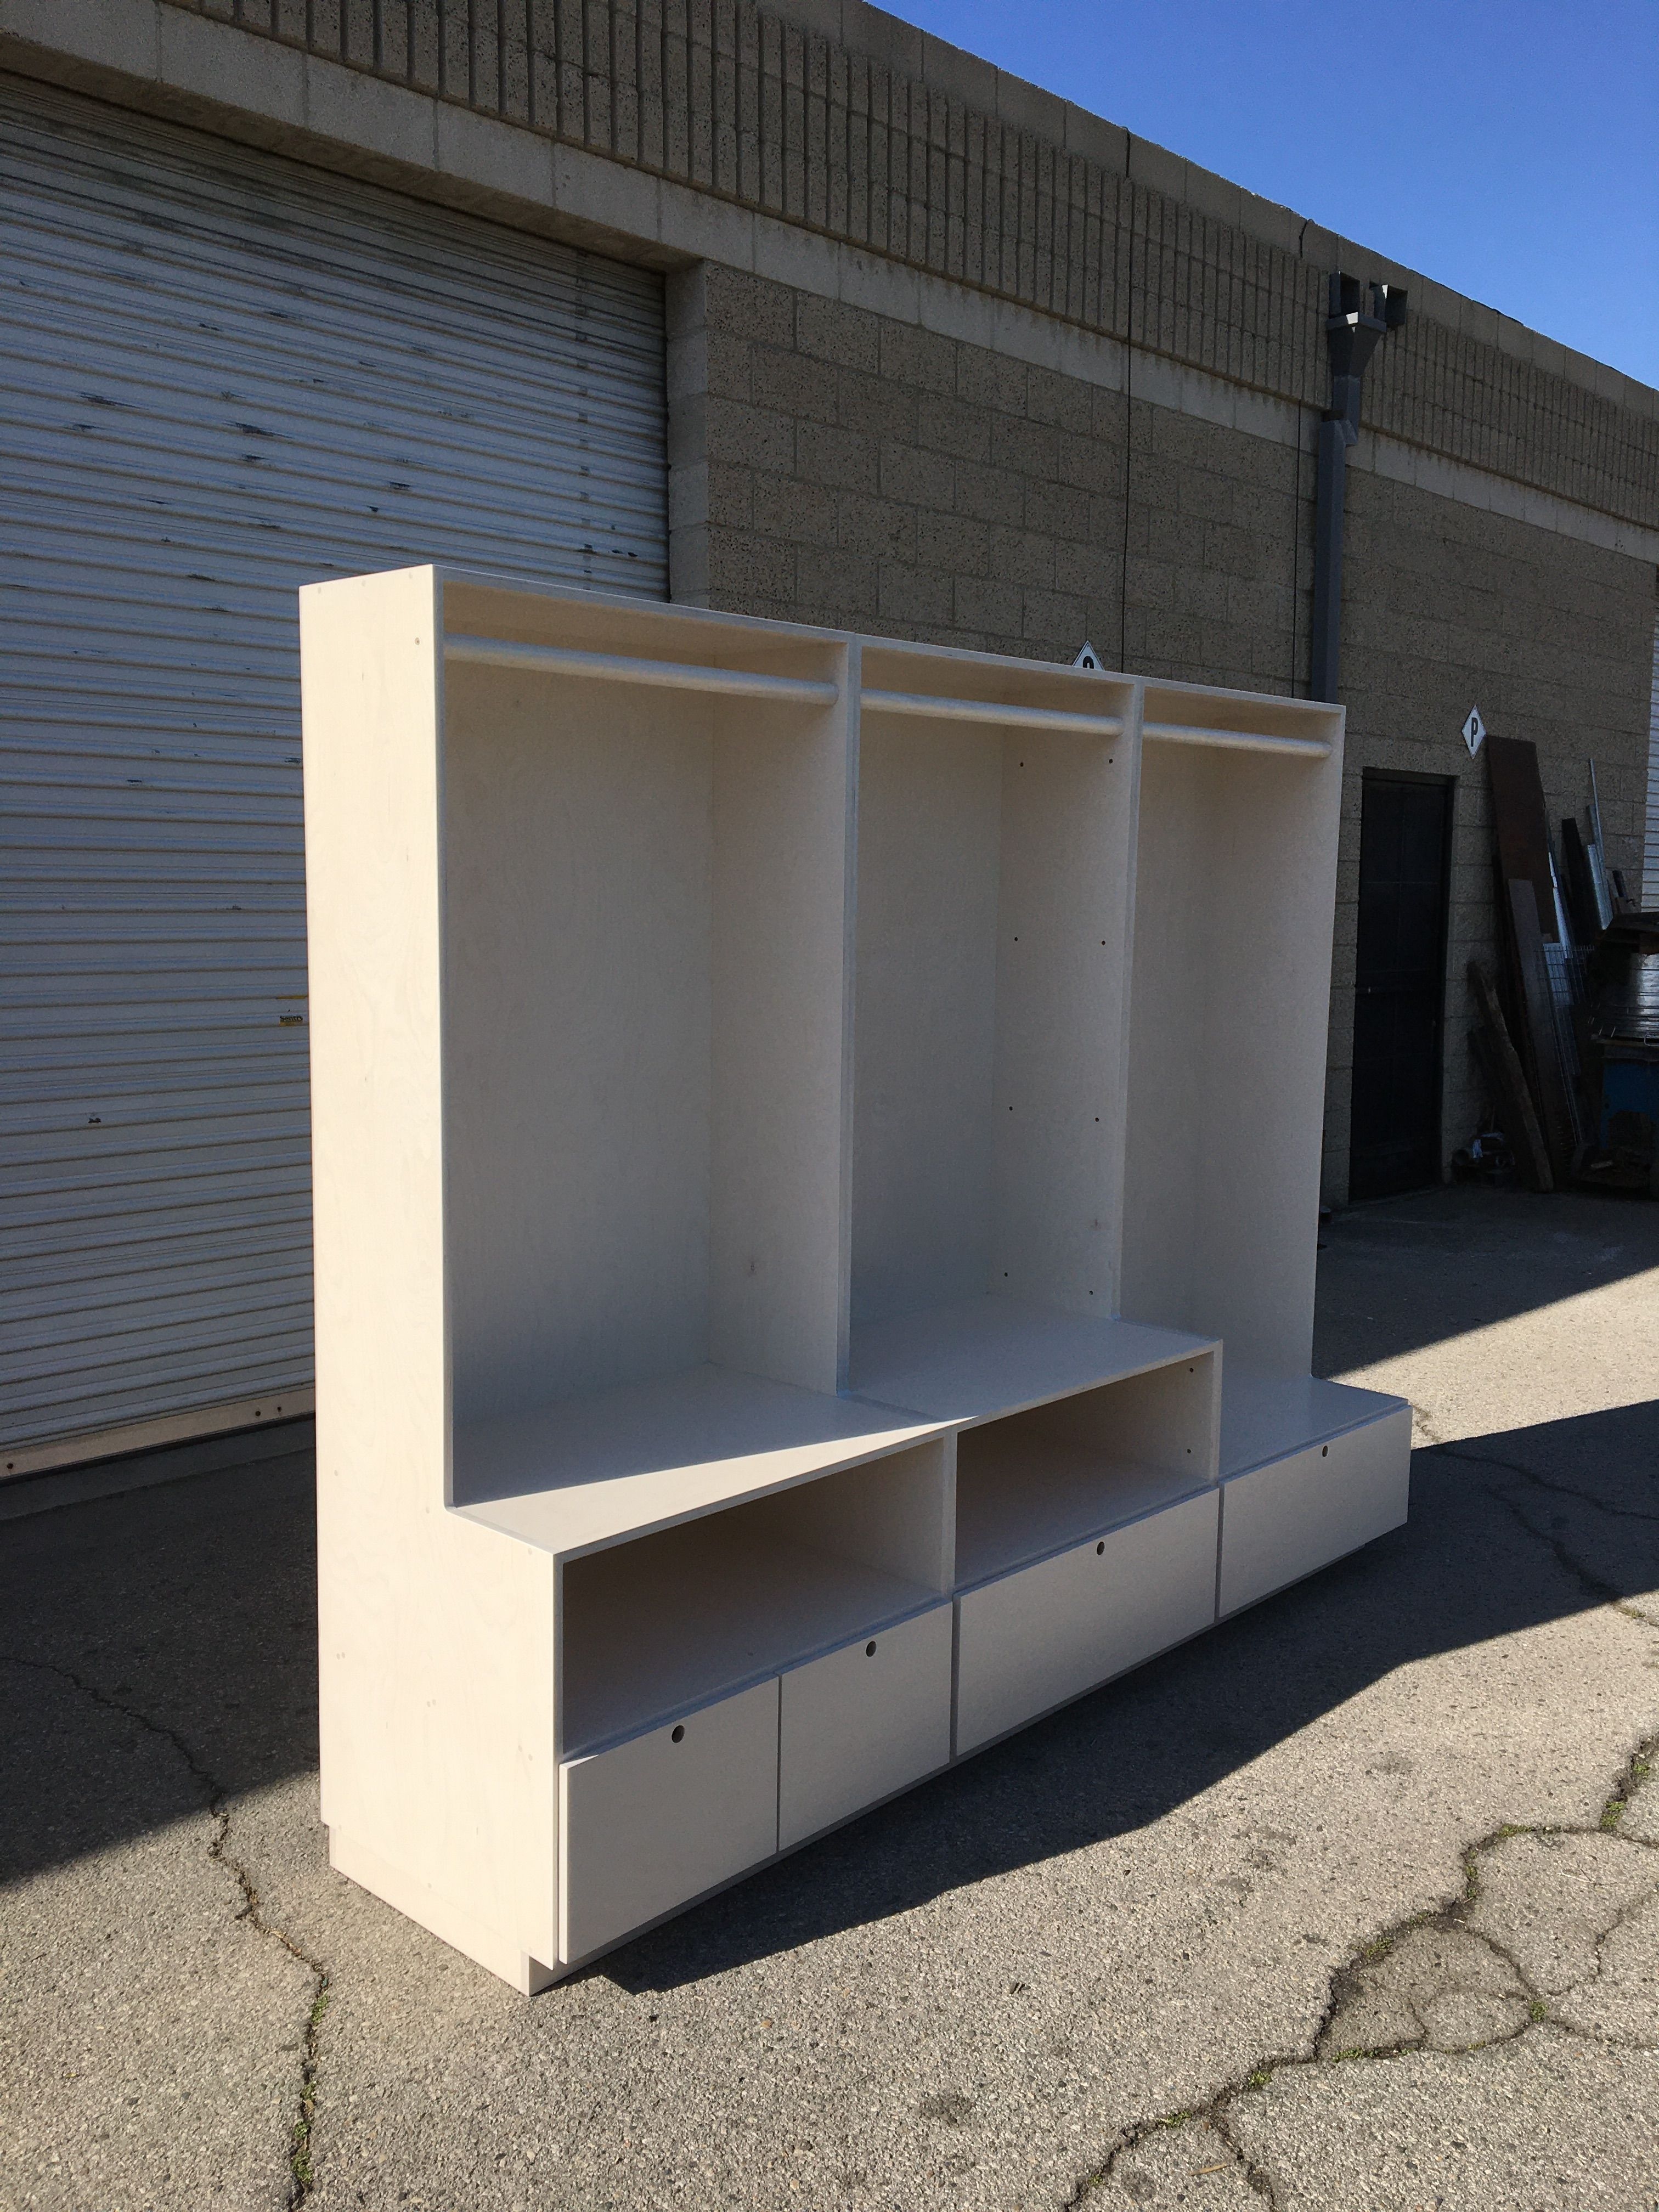 Three Section Closet product image 2